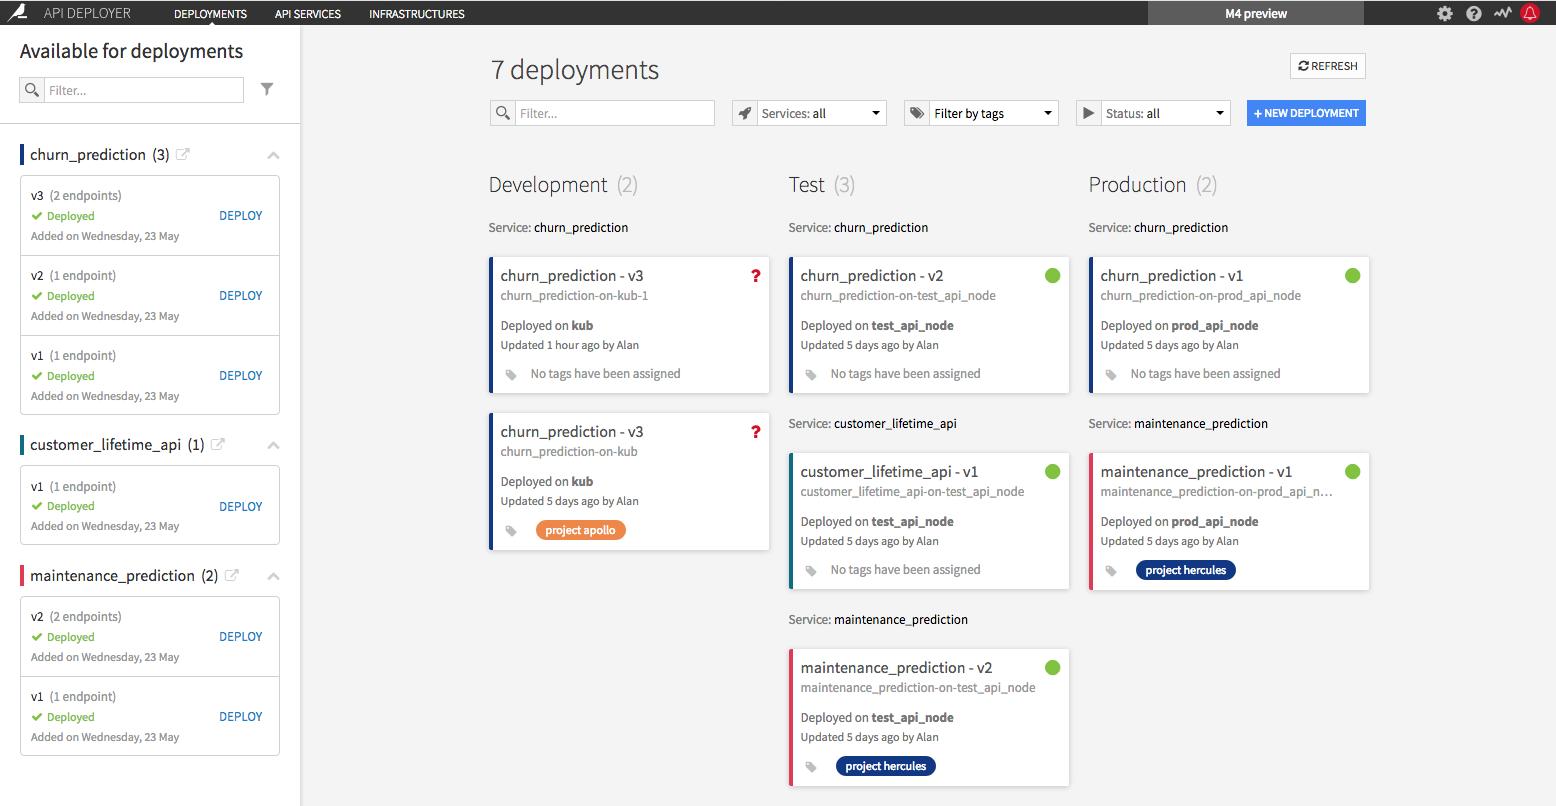 dataiku model api deployer for operationalization